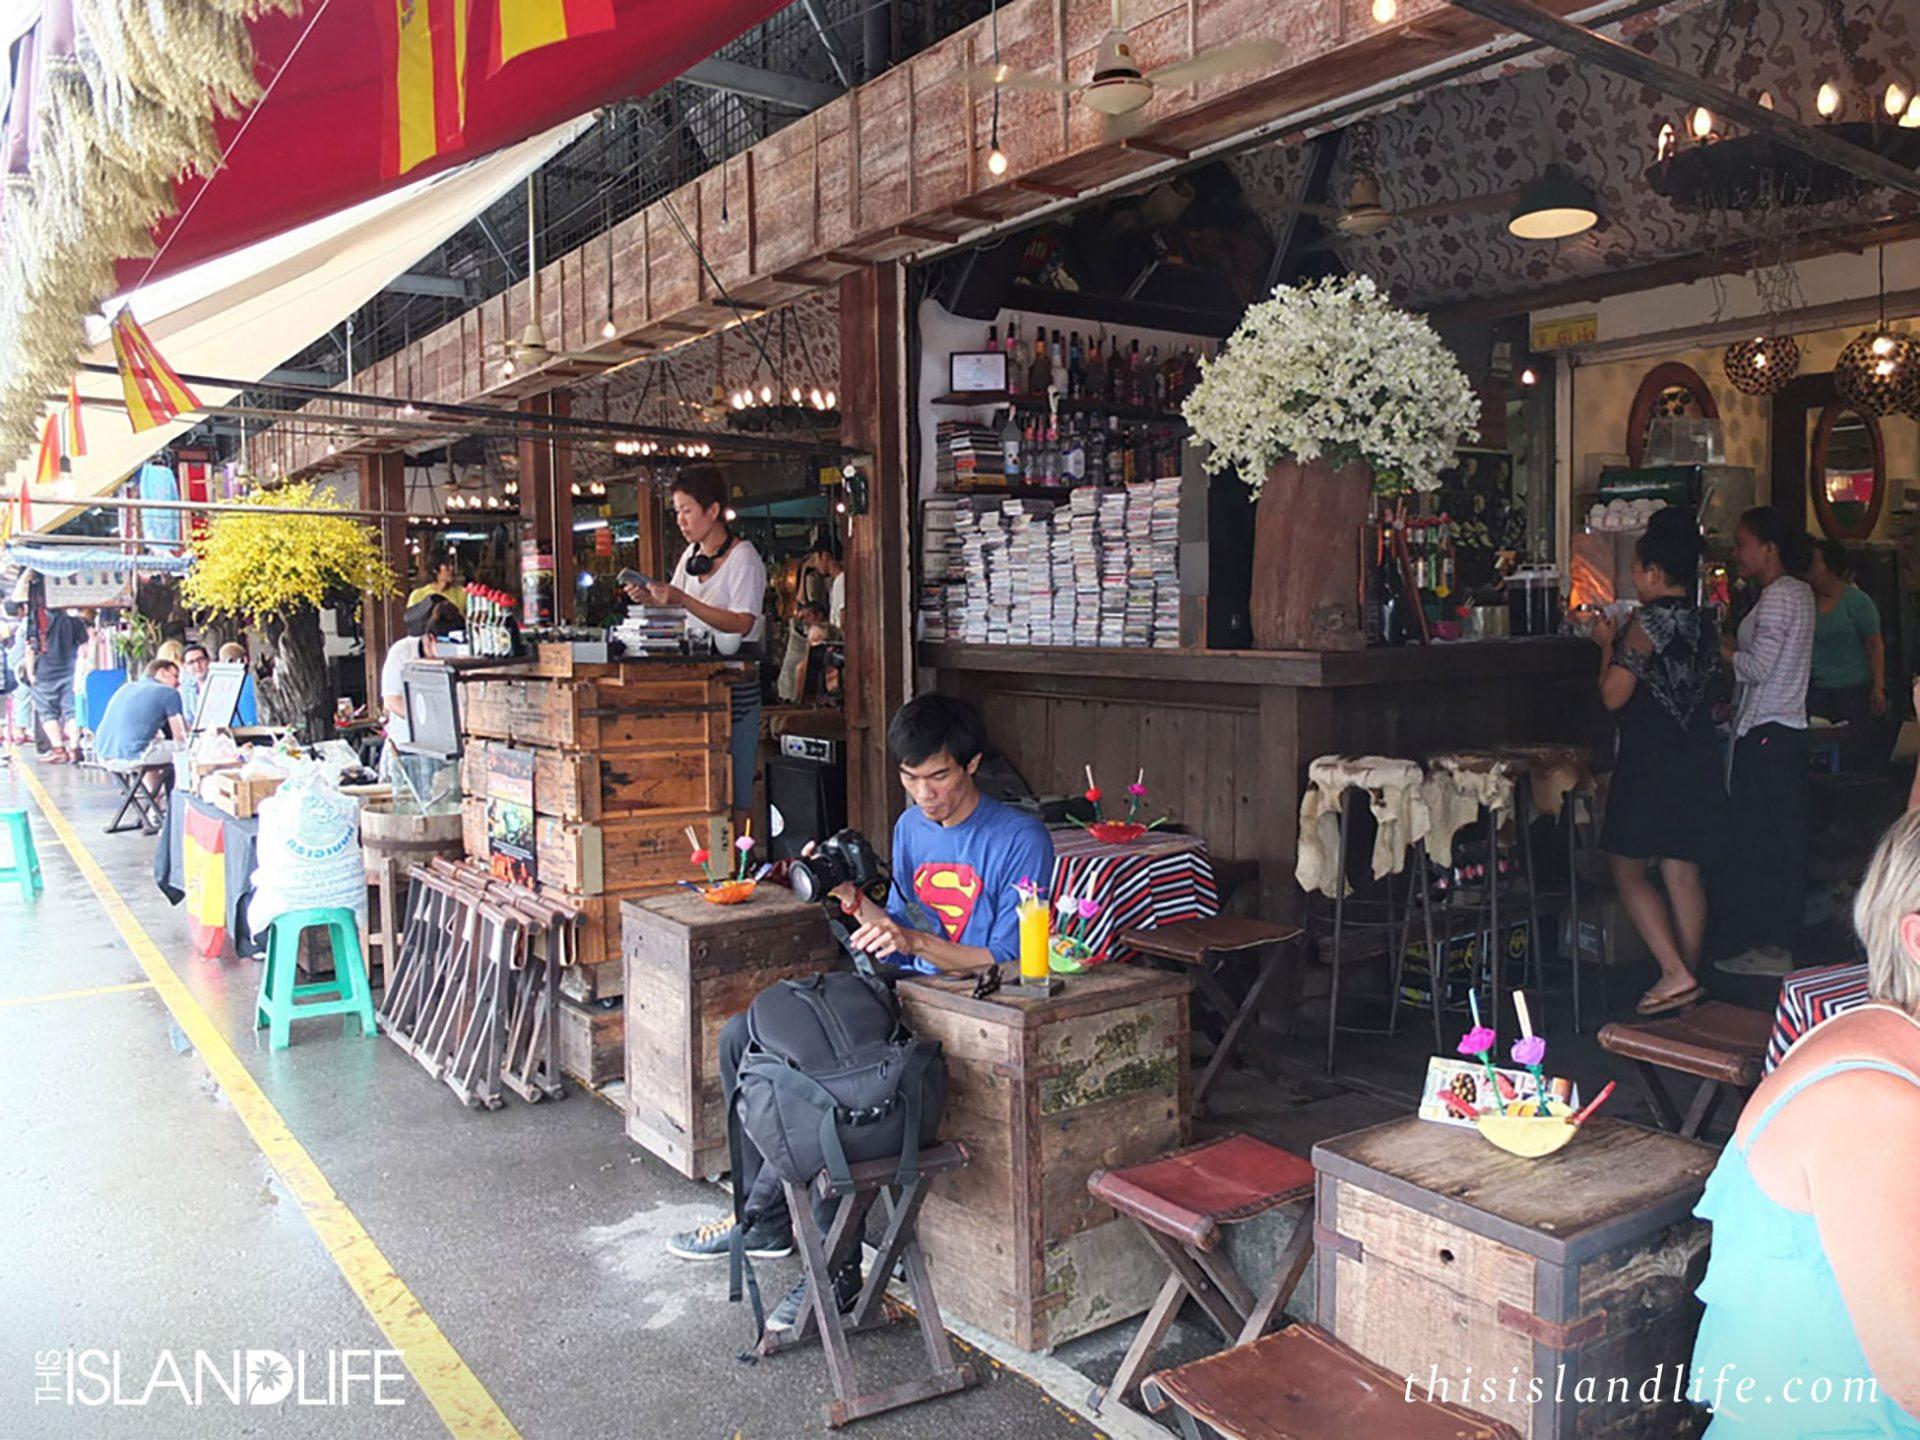 chatuchak-weekend-market-bangkok-thailand-this-island-life-31